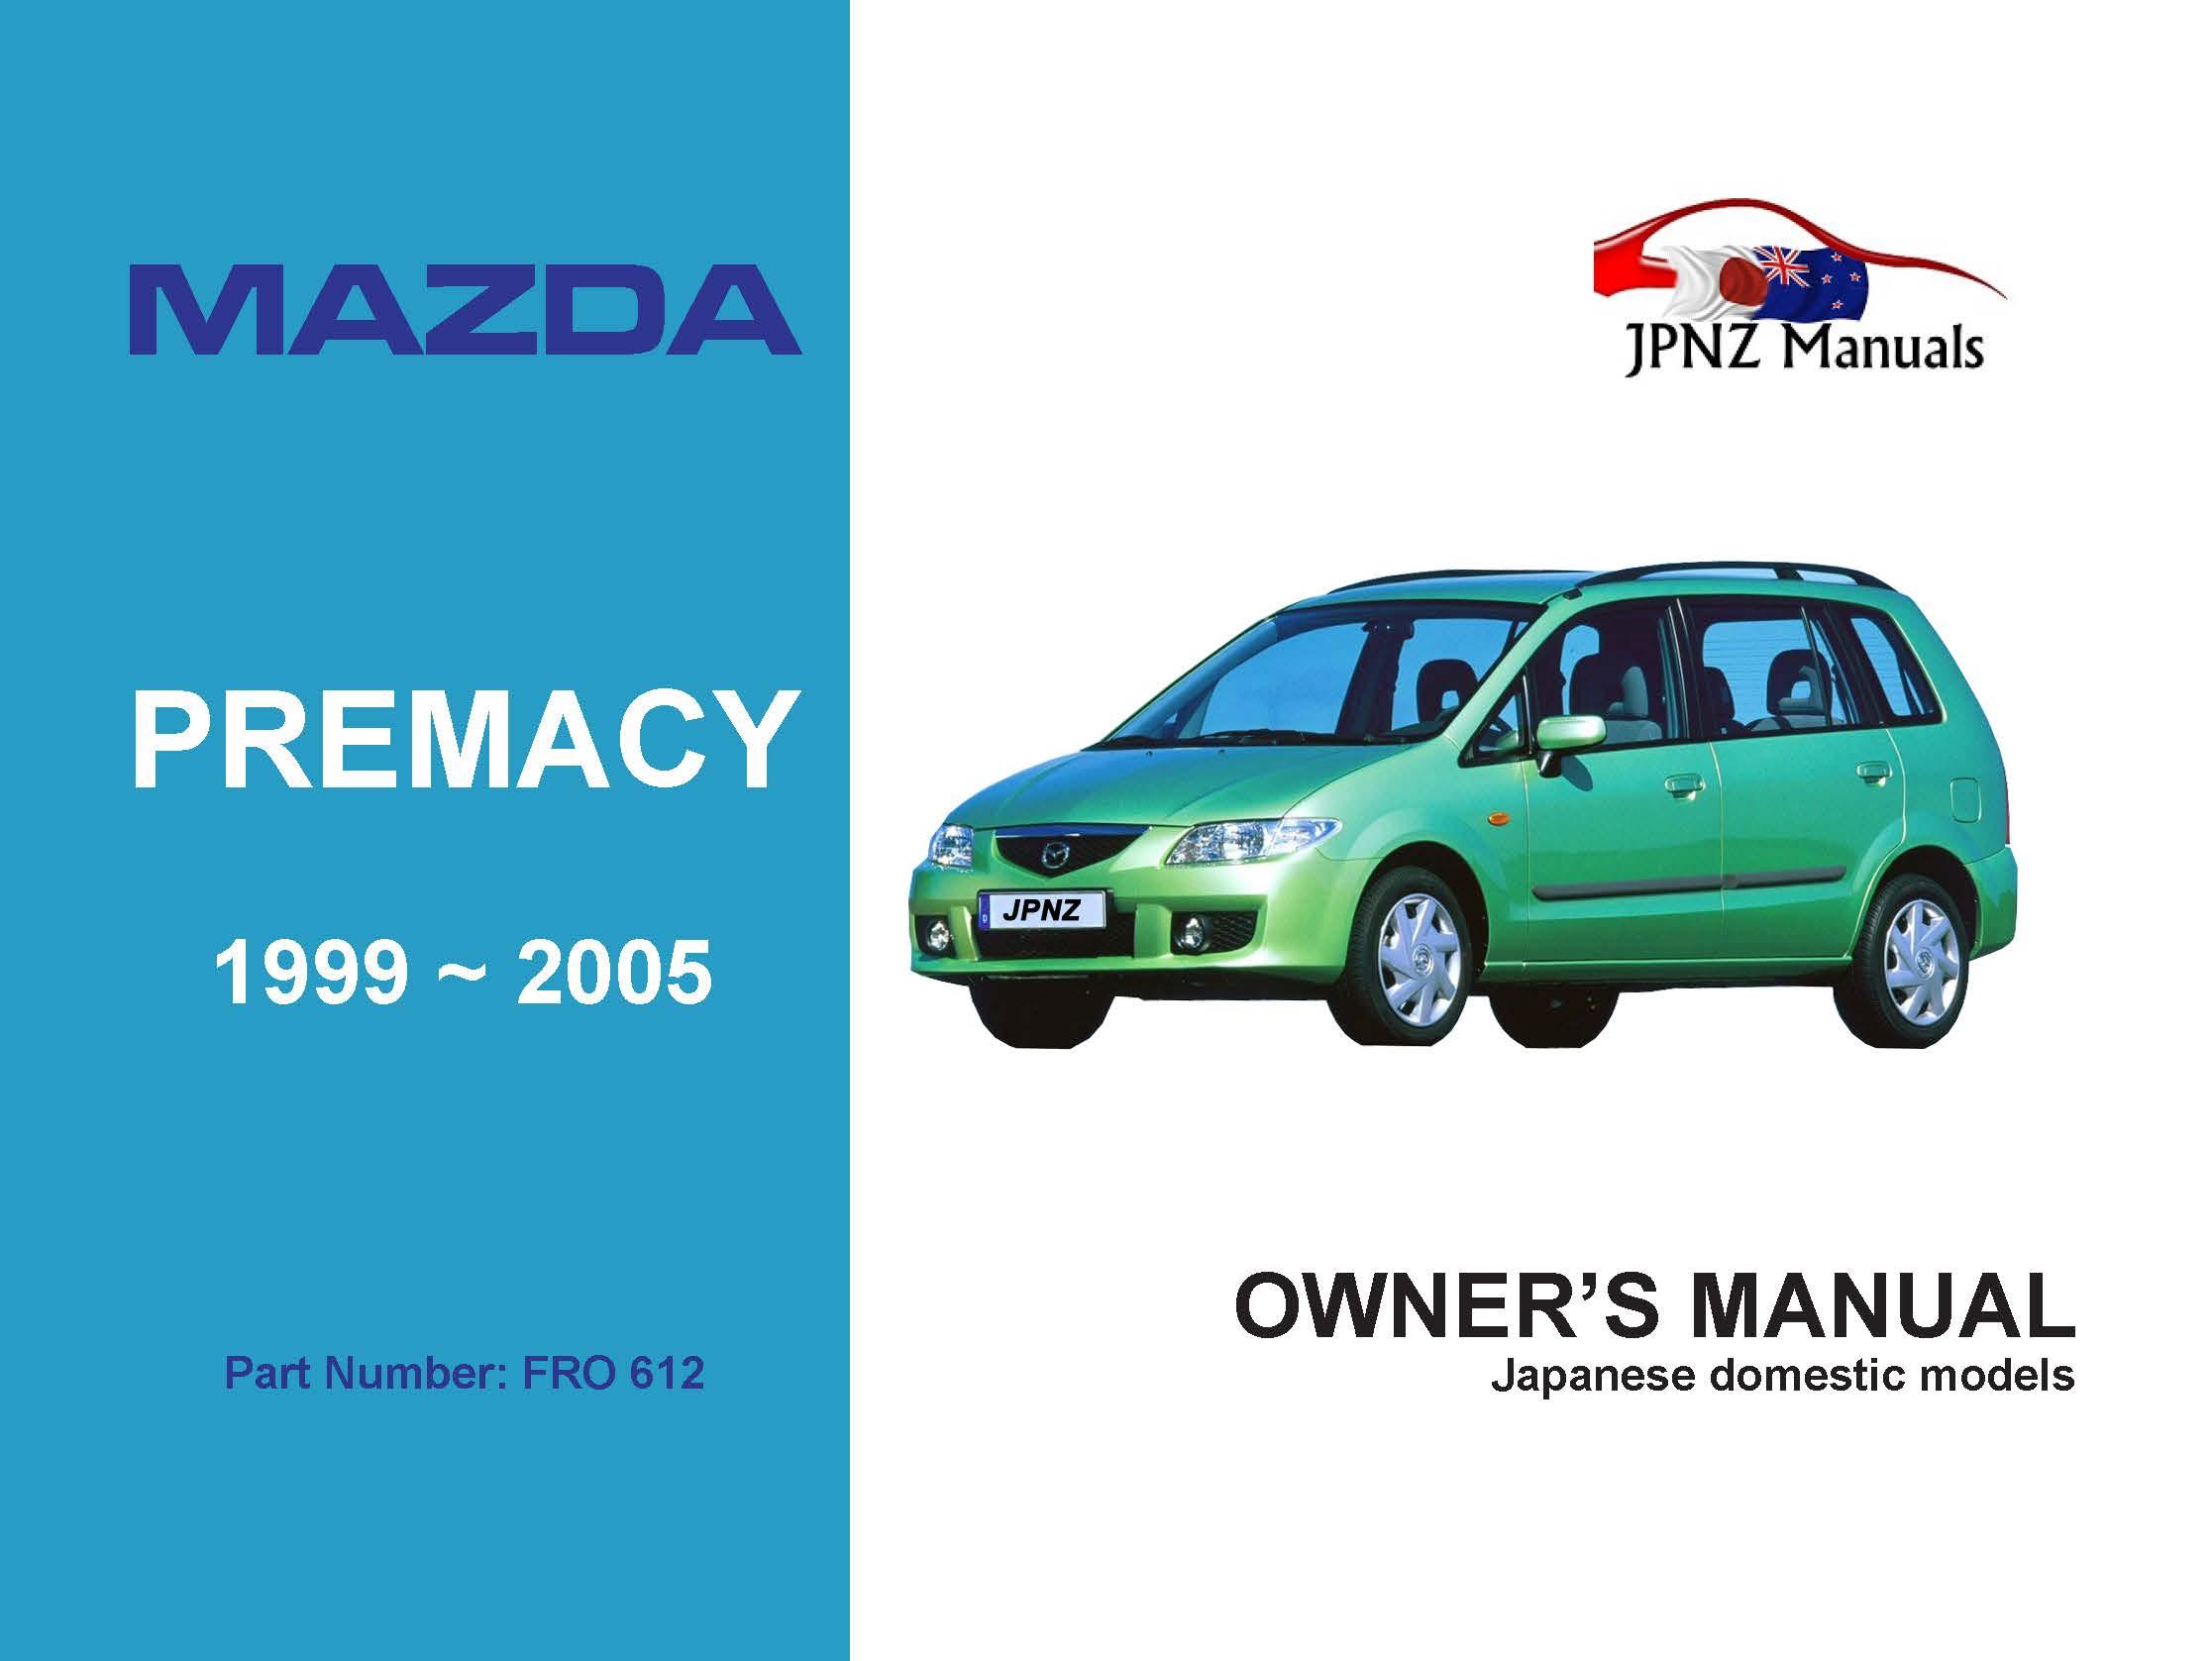 Mazda - Premacy Car Owners User Manual In English | 1999 ~ 2005